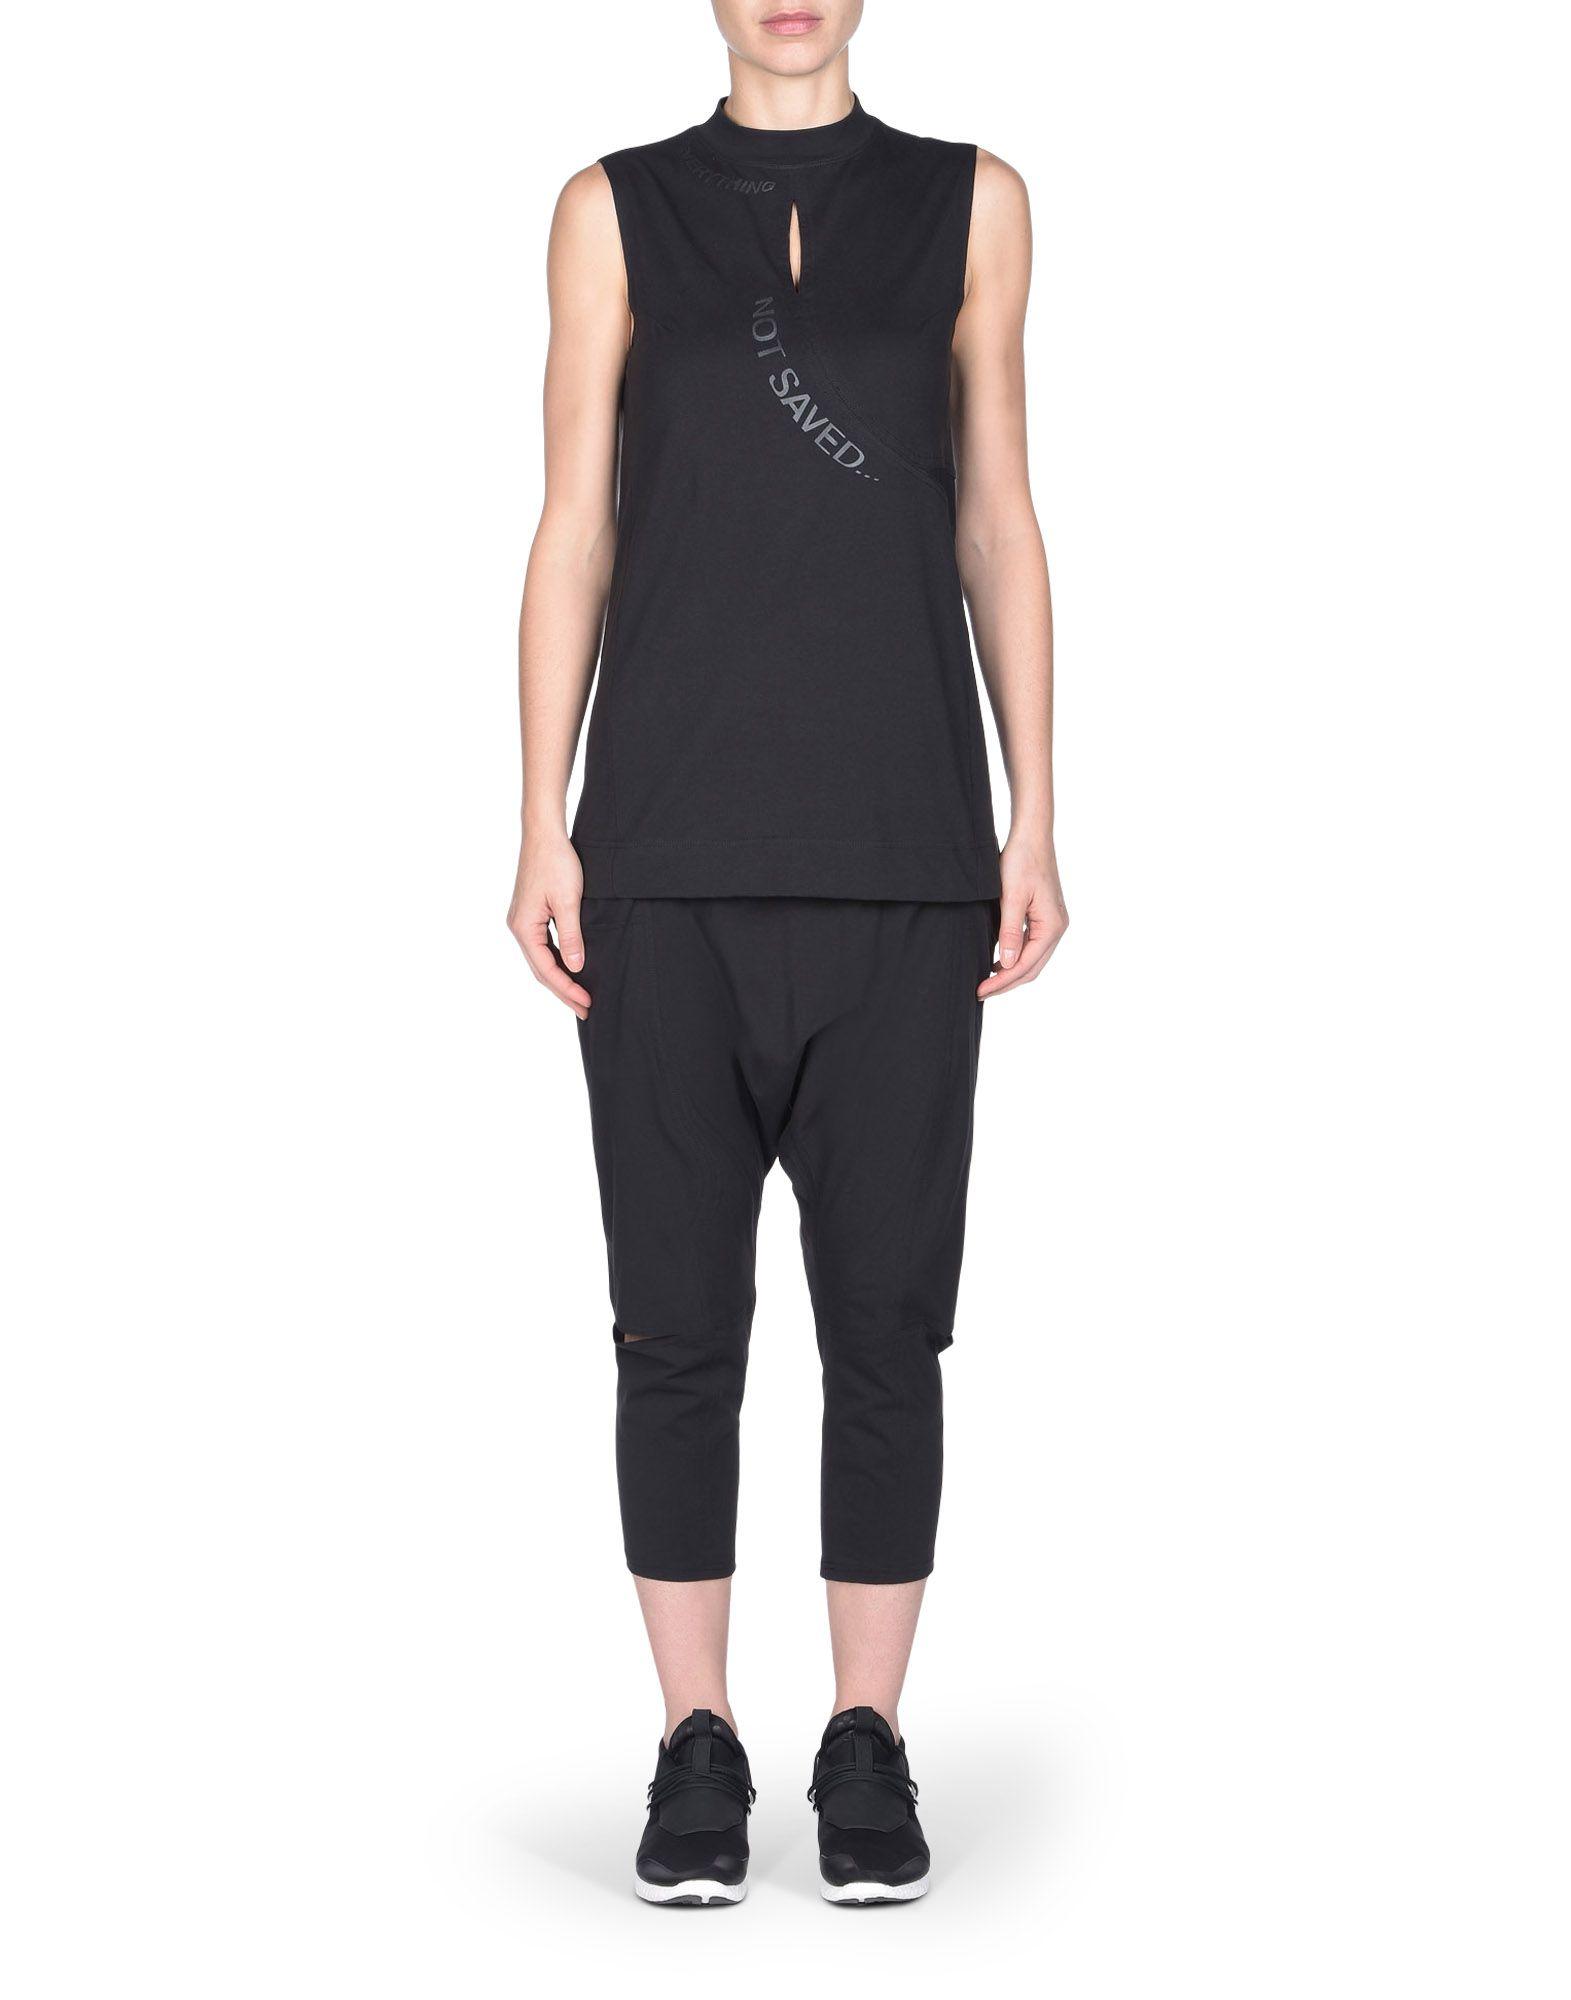 Y-3 JERSEY SAROUEL PANT PANTS woman Y-3 adidas